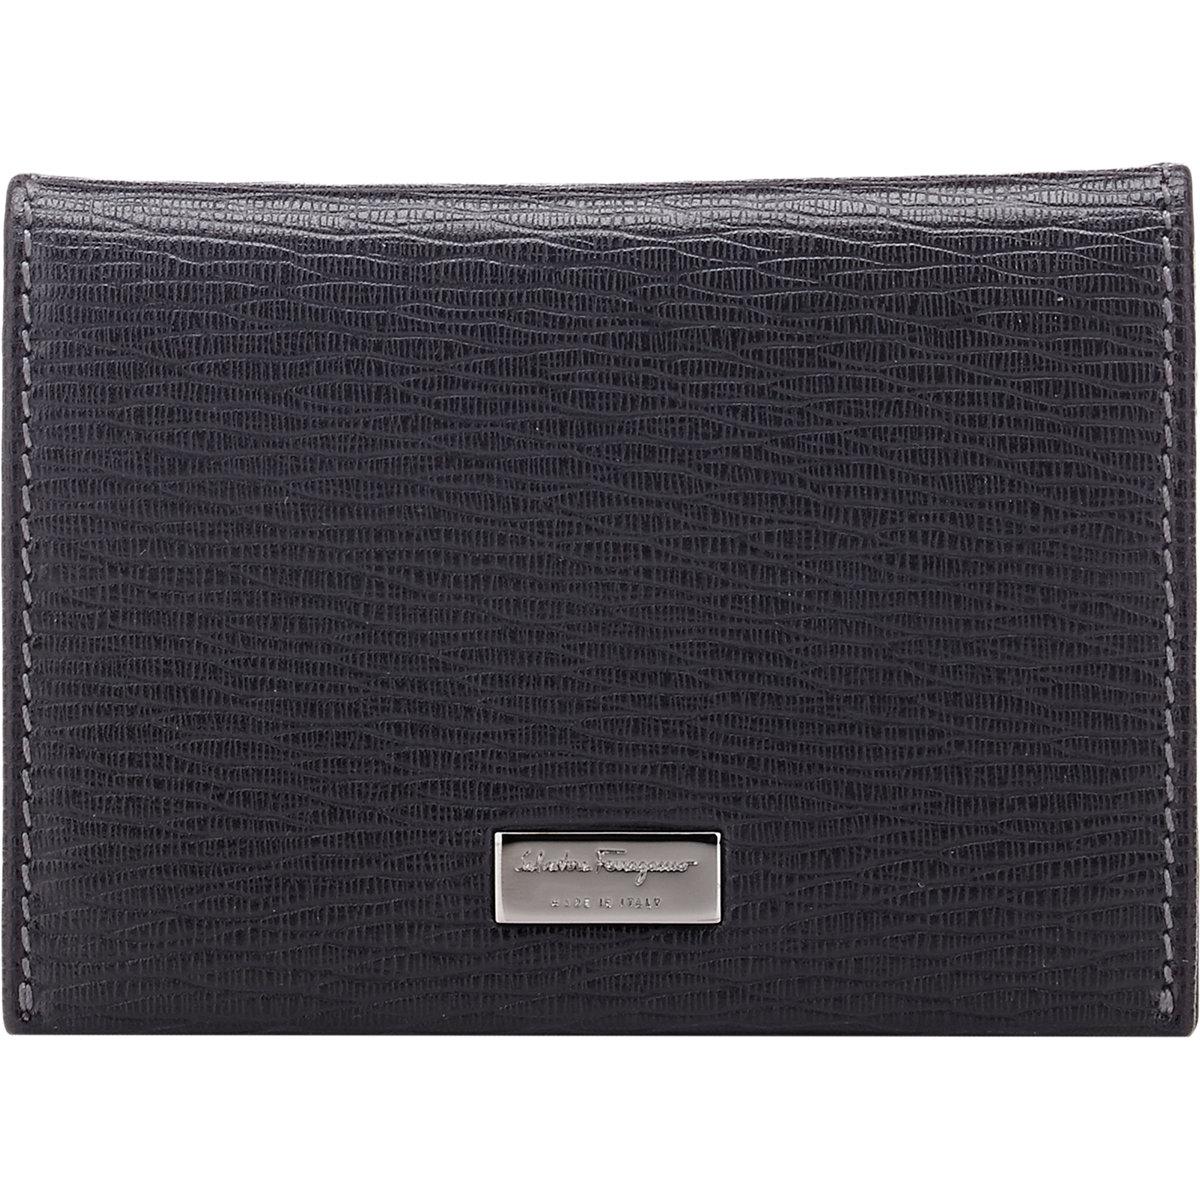 Lyst - Ferragamo Revival Folding Card Case in Black for Men acdf33421244e